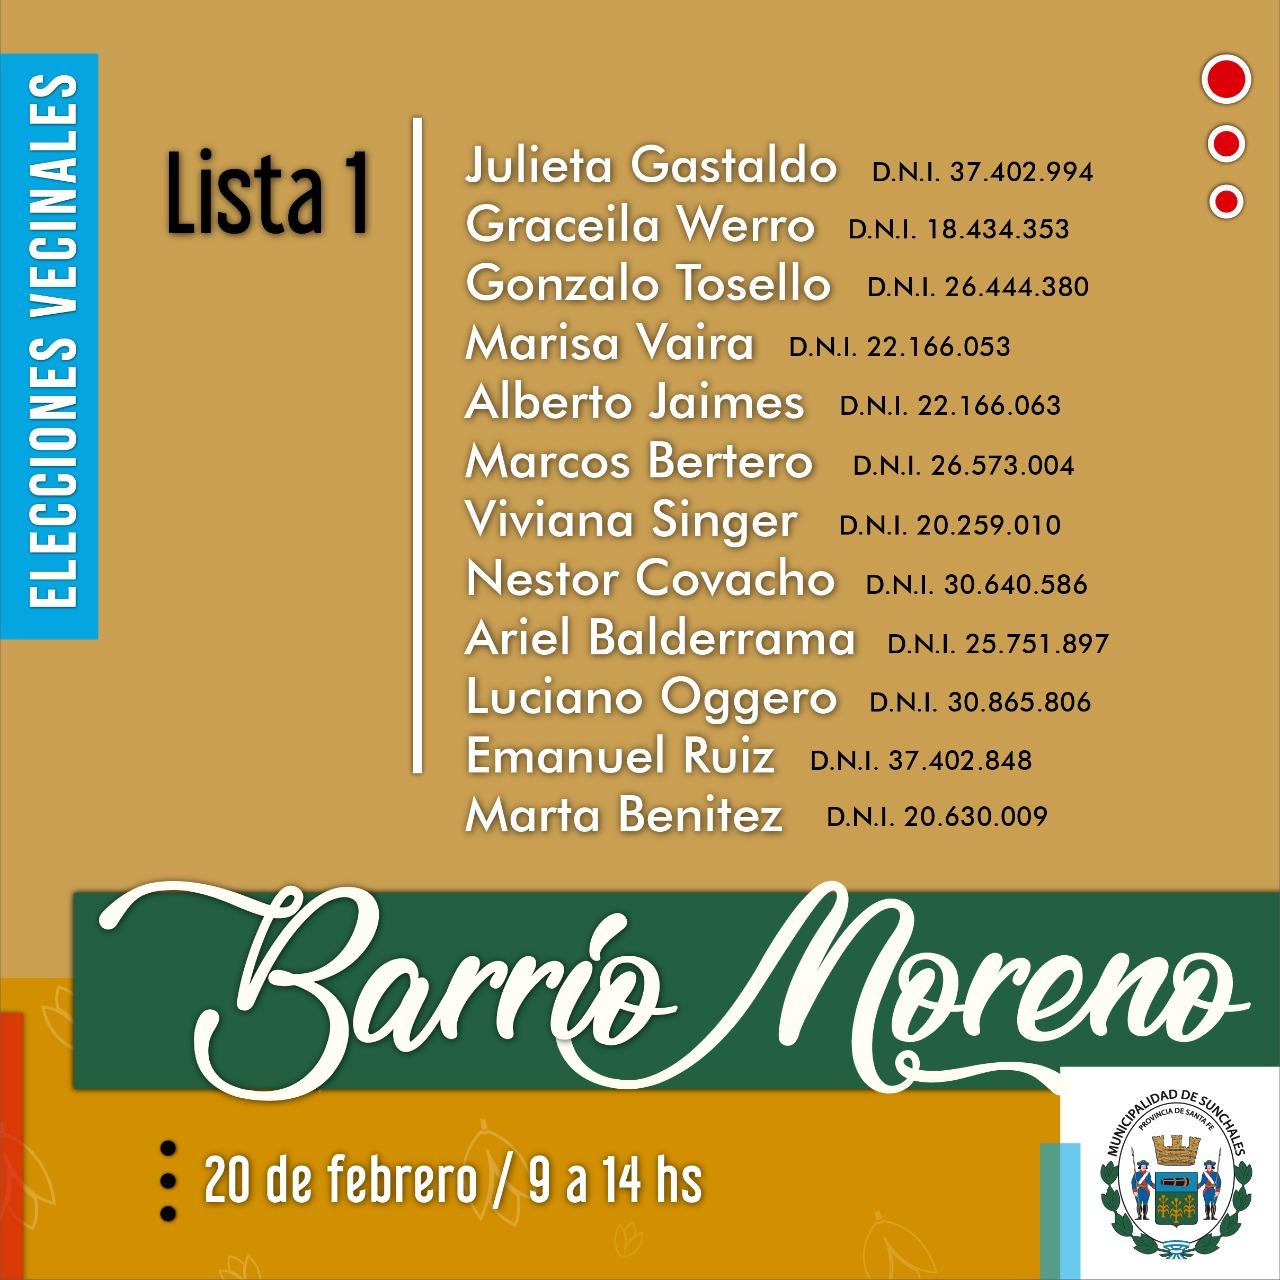 Lista 1 Moreno